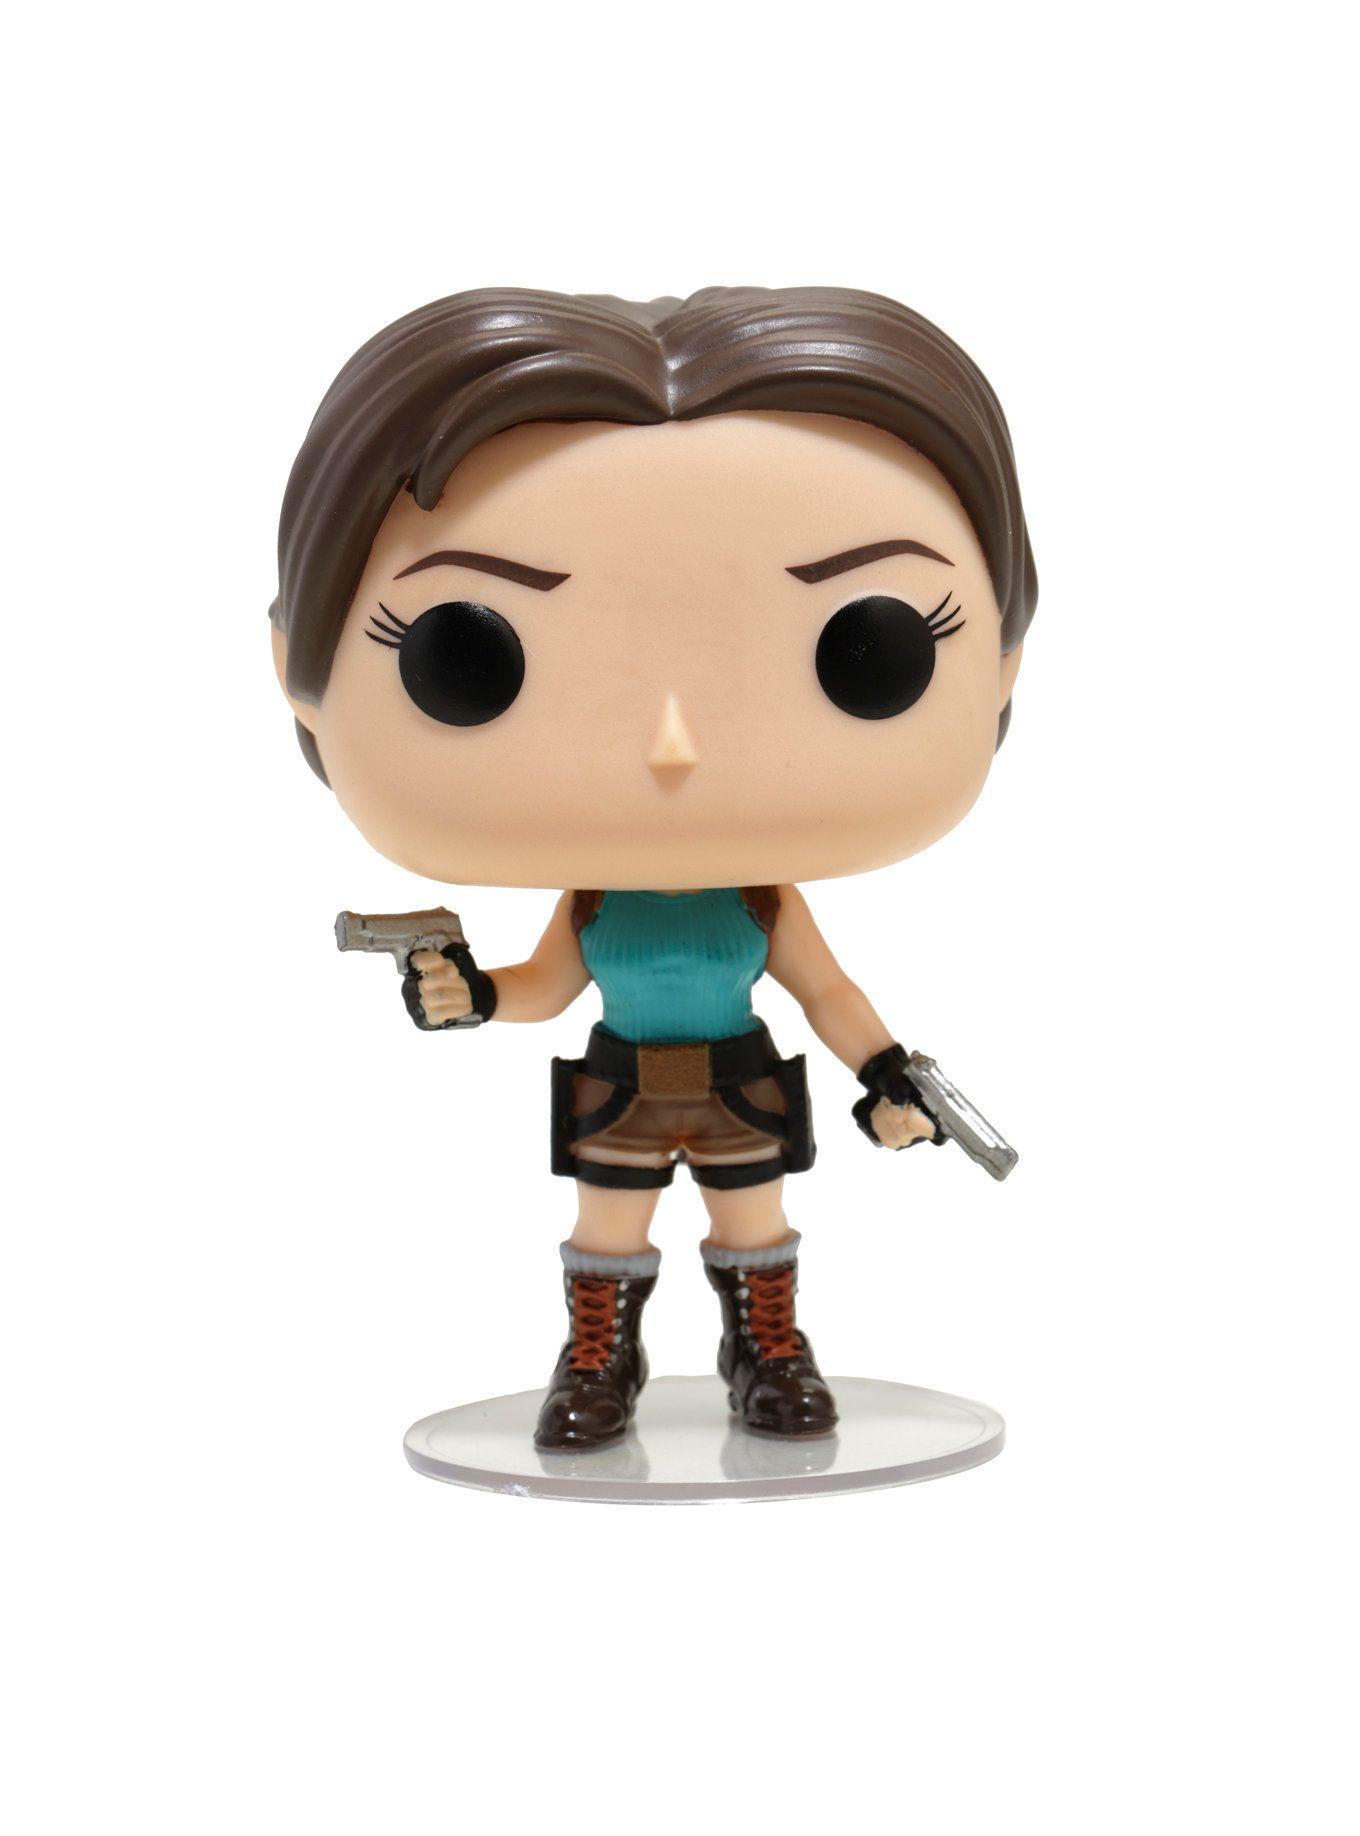 Funko Tomb Raider Pop Games Lara Croft Vinyl Figure Vinyl Figures Lara Croft Pop Games